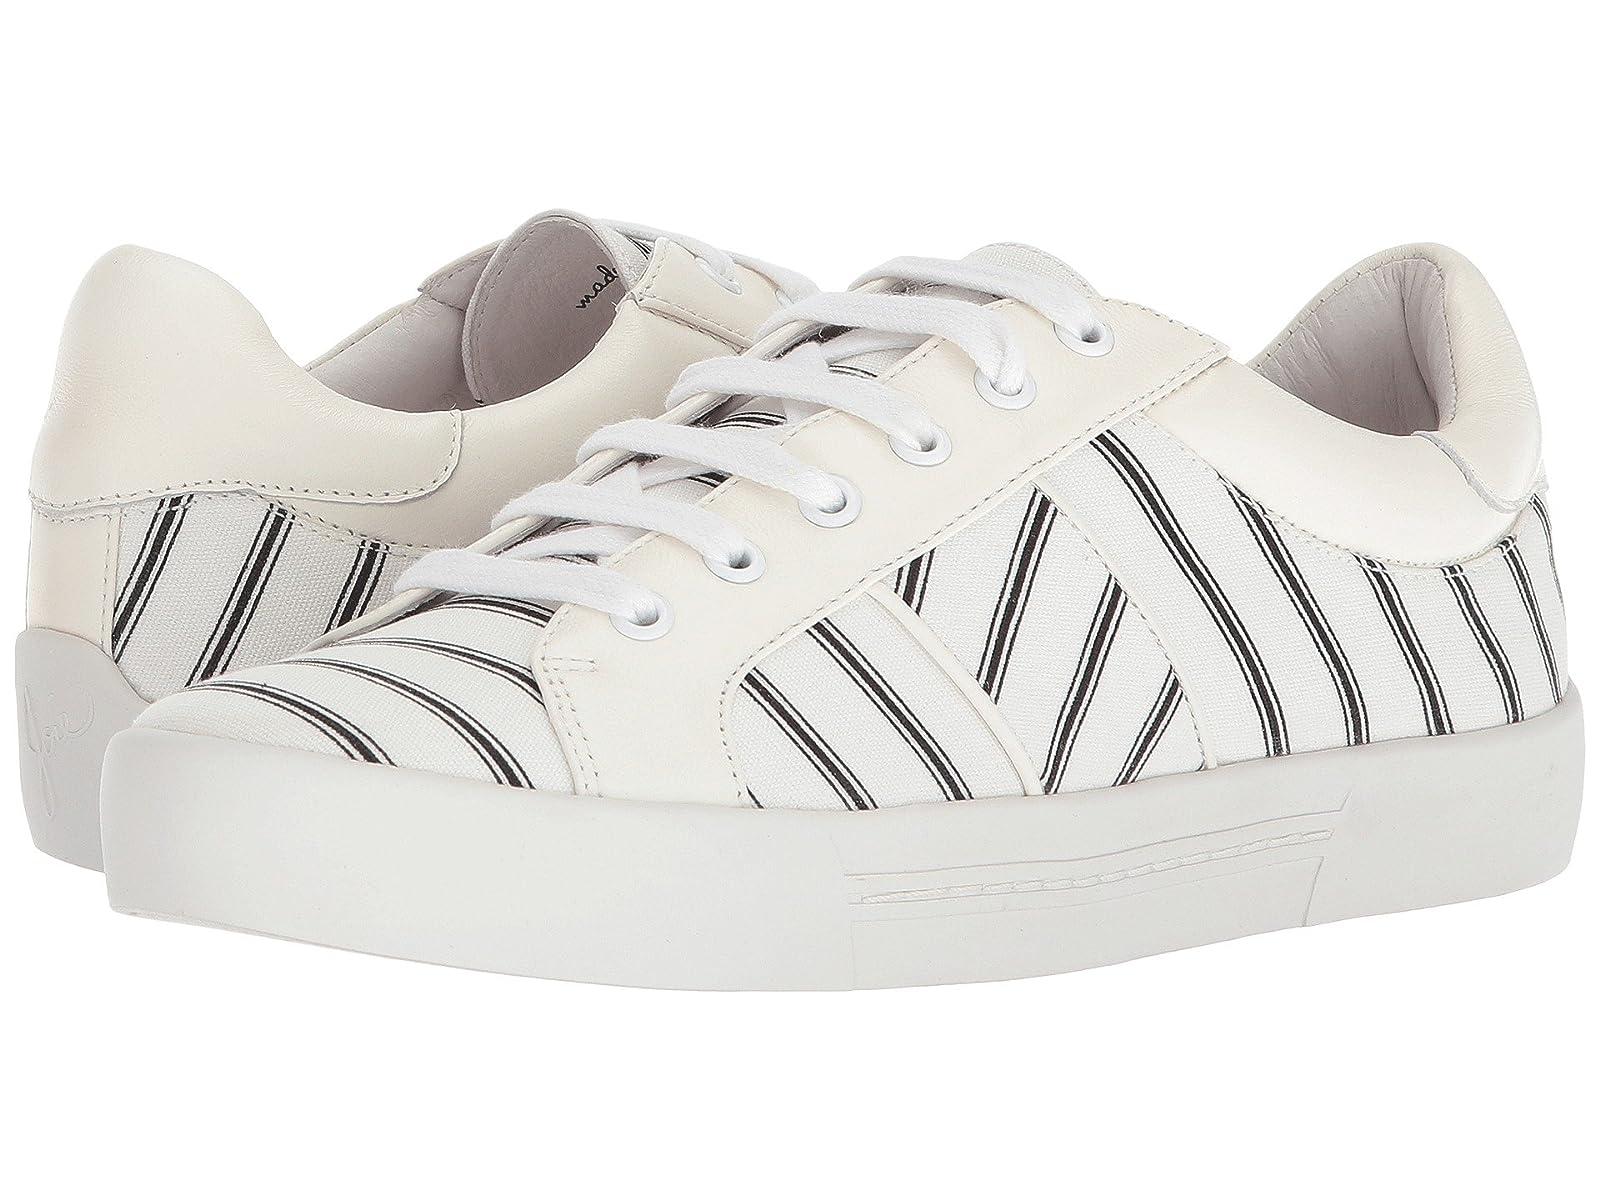 Joie DakotaCheap and distinctive eye-catching shoes